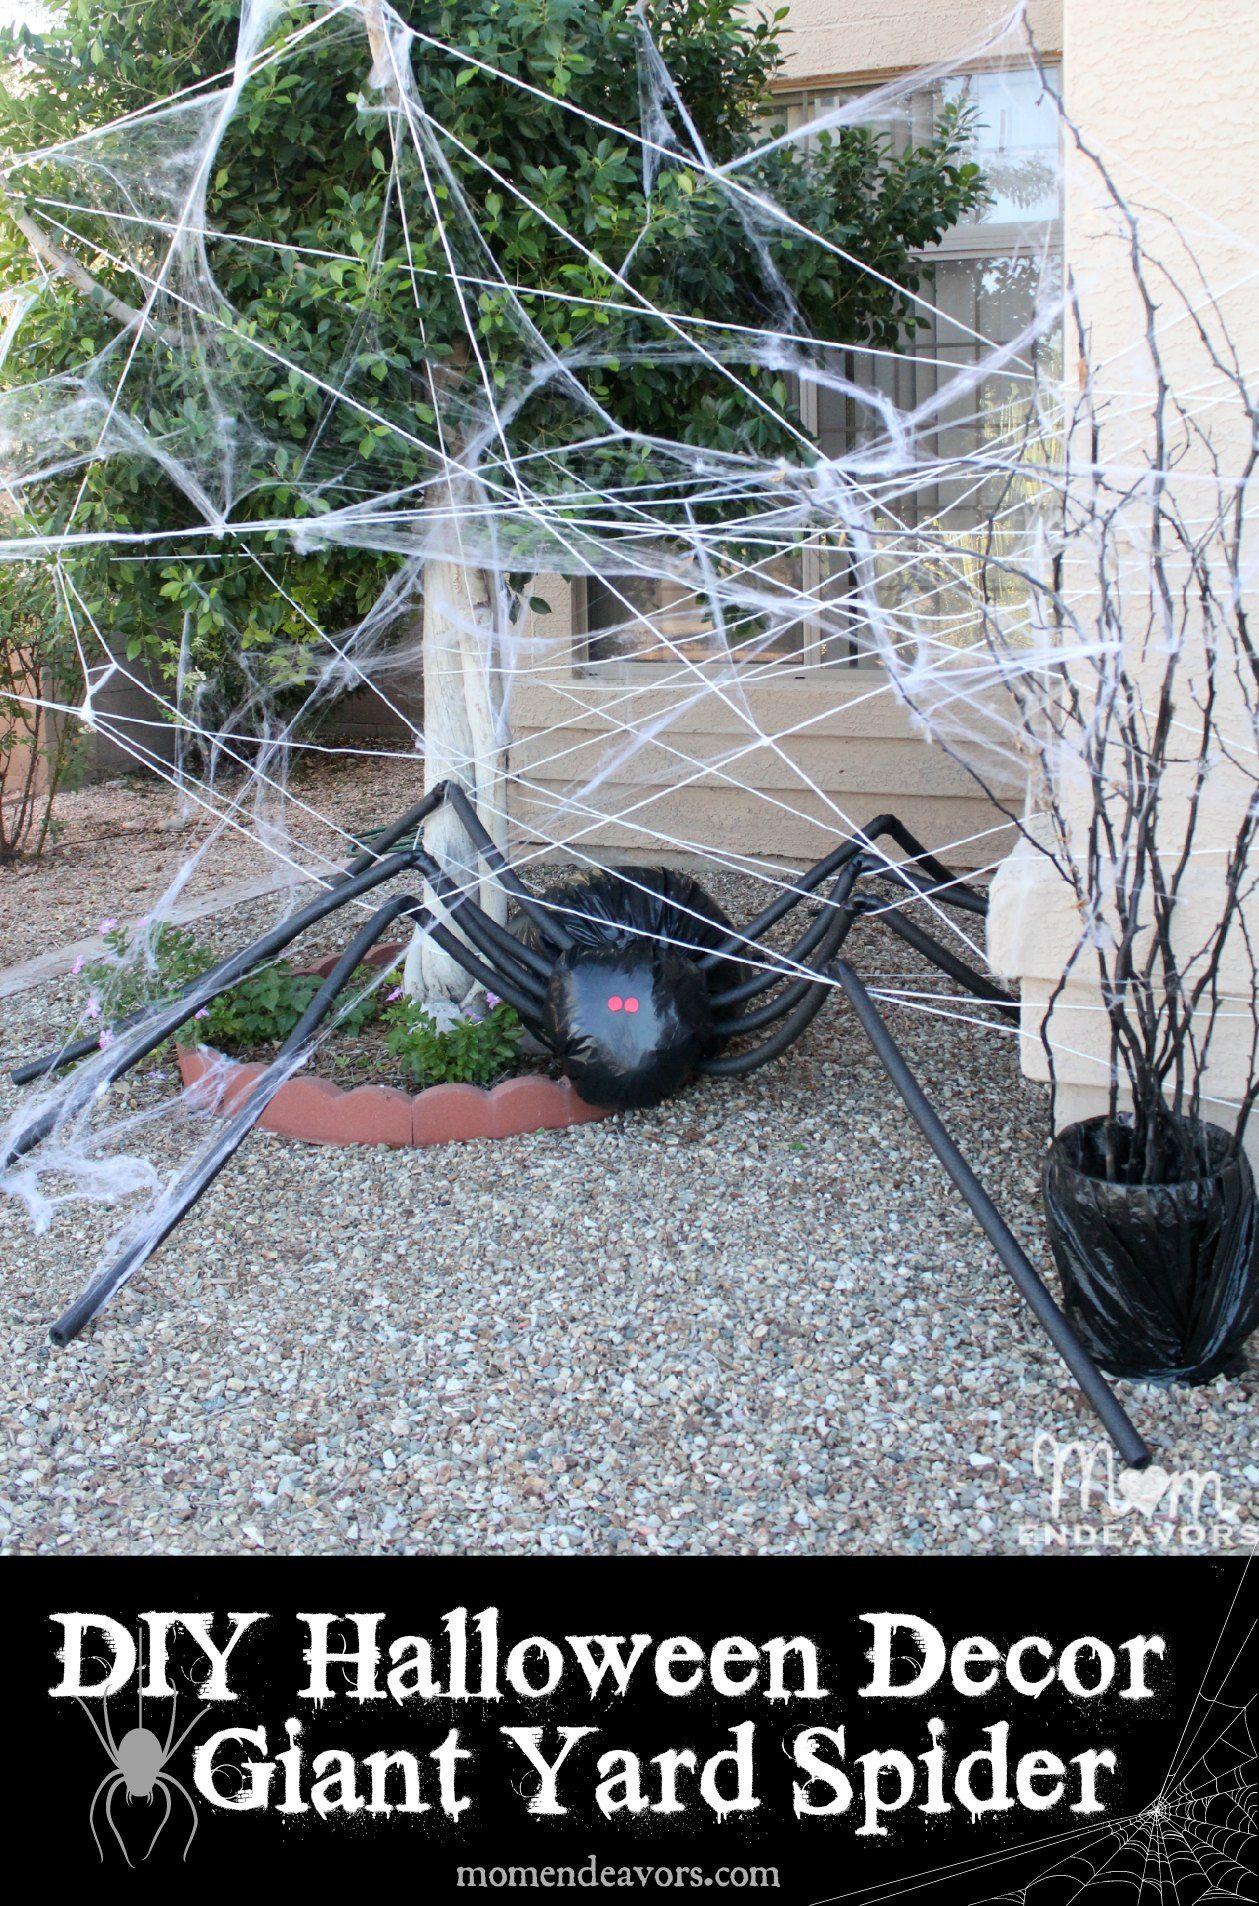 Diy Halloween Yard Decor Giant Spider In Spiderweb Full